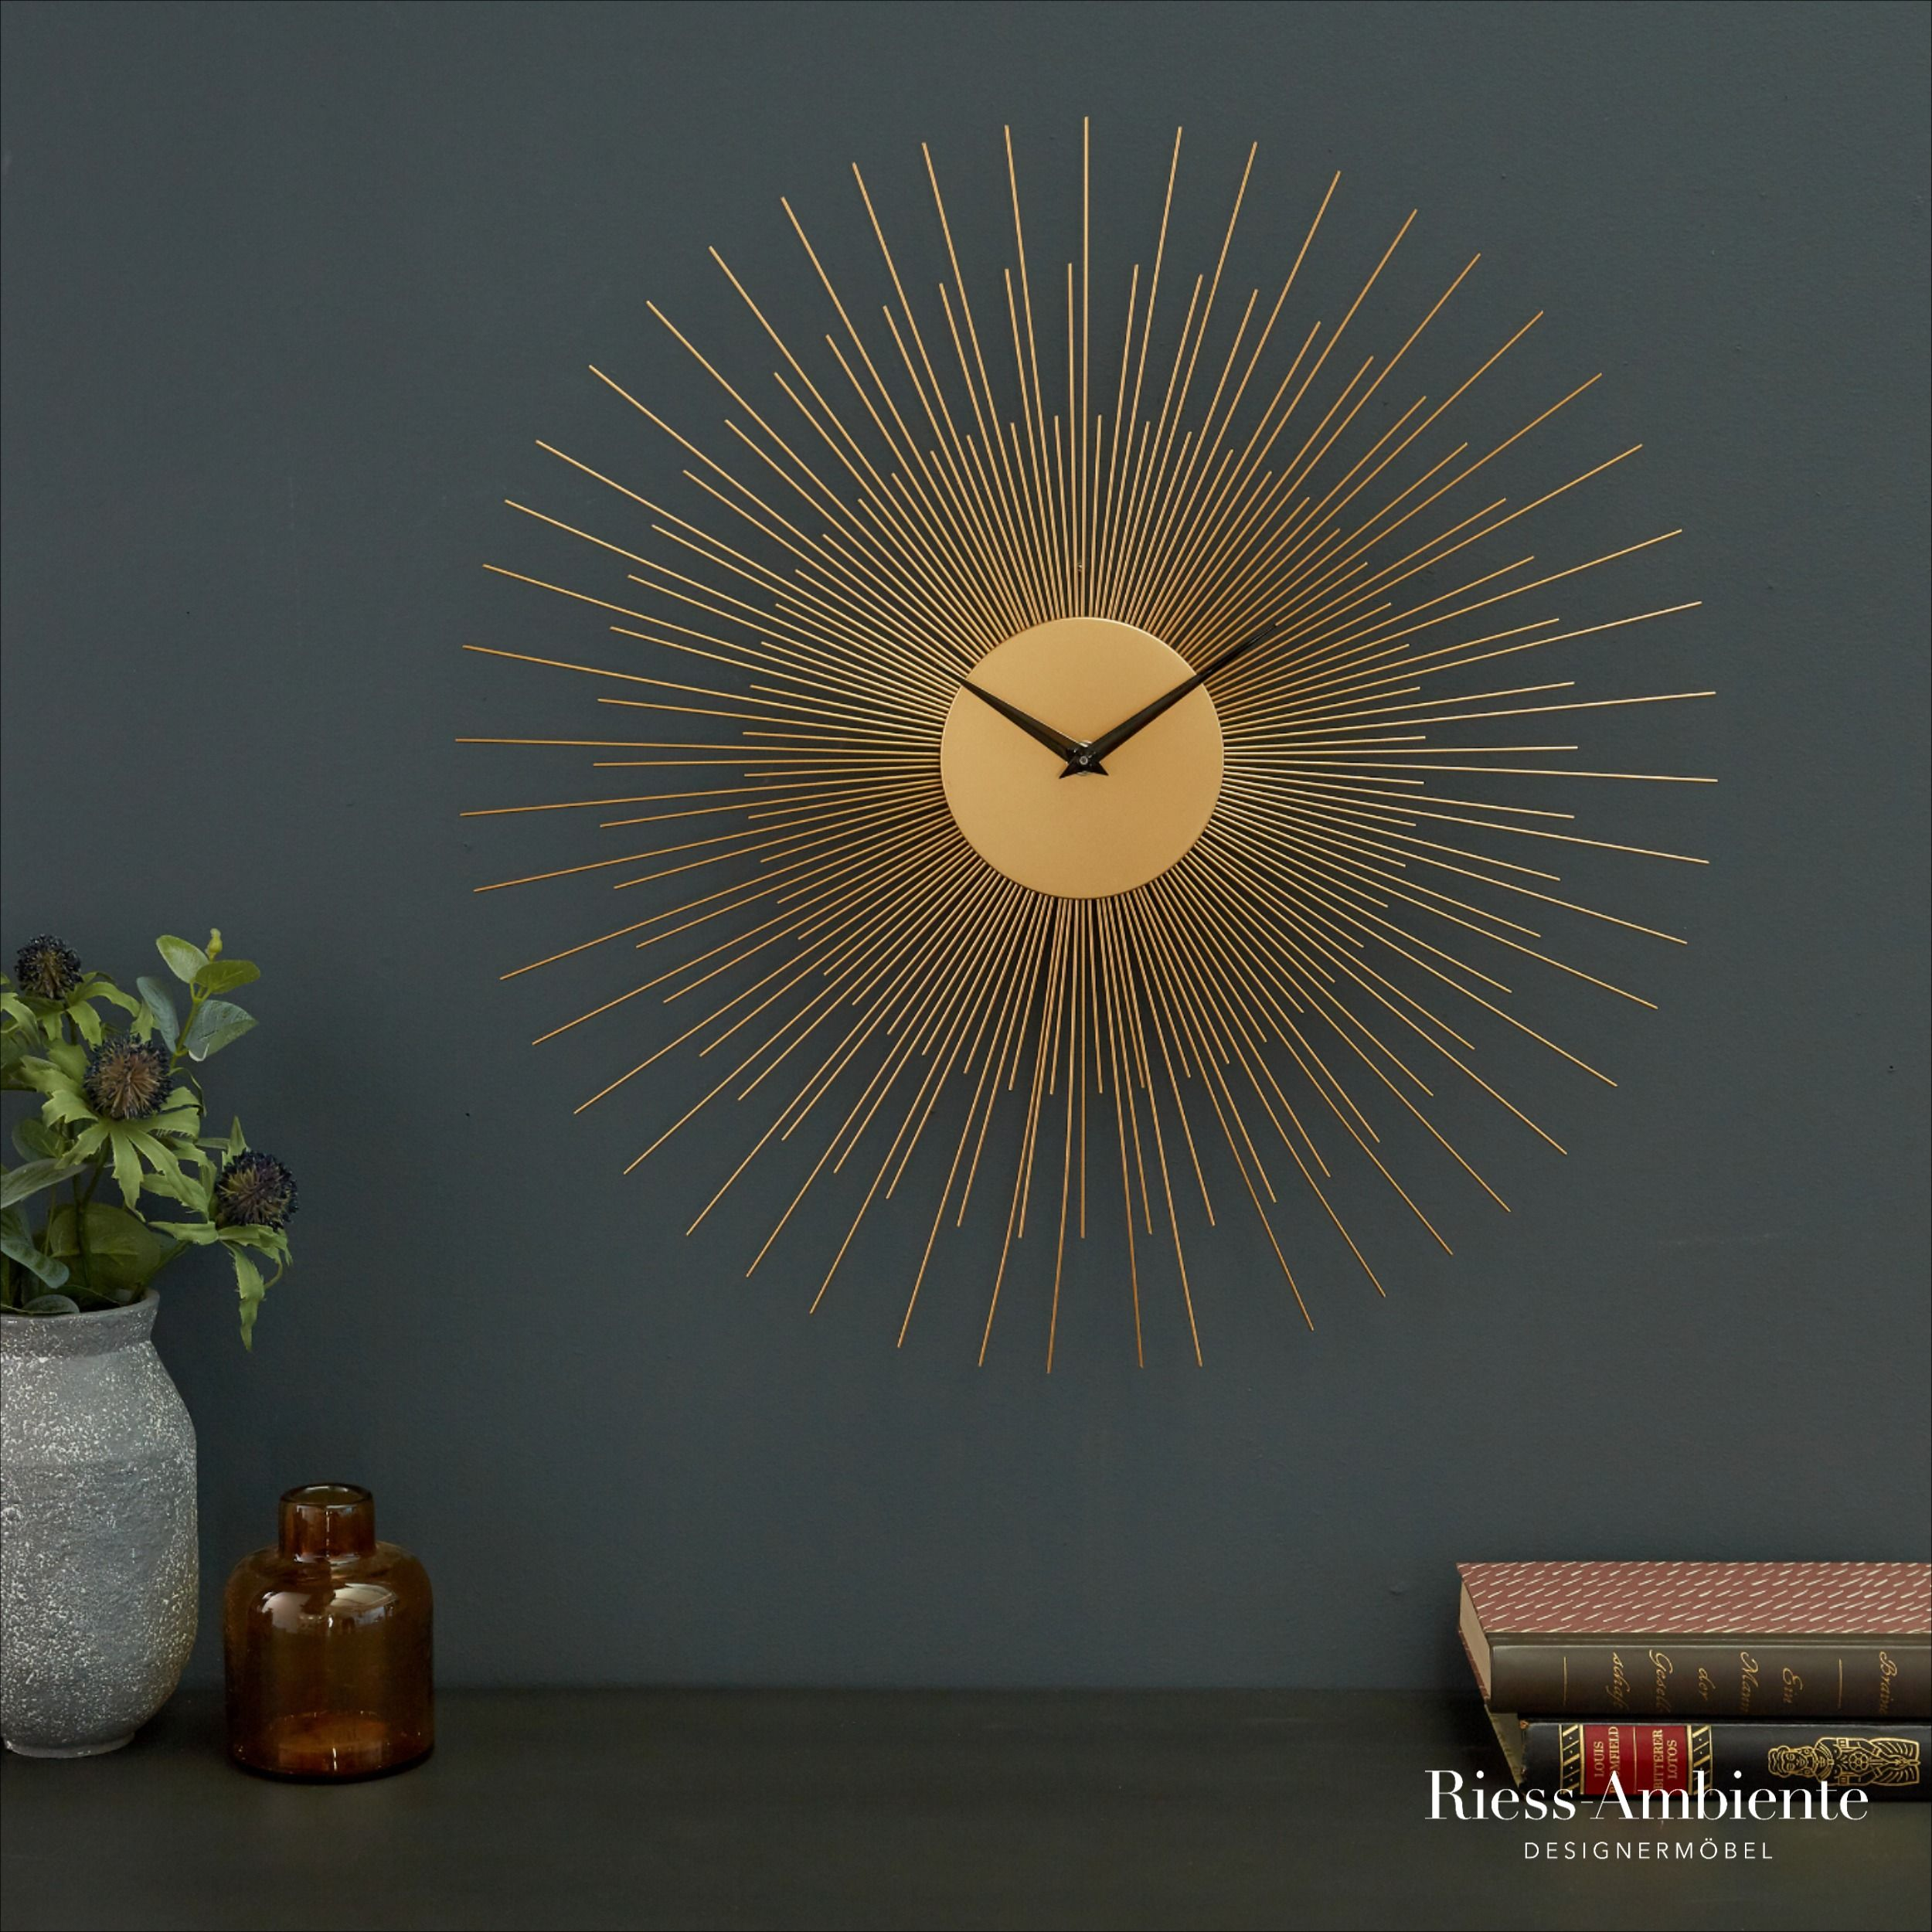 Extravagante Wanduhr Infinity Home 50cm Gold Wanddekoration In 2020 Wanduhr Wanduhren Wohnzimmer Wanddekoration